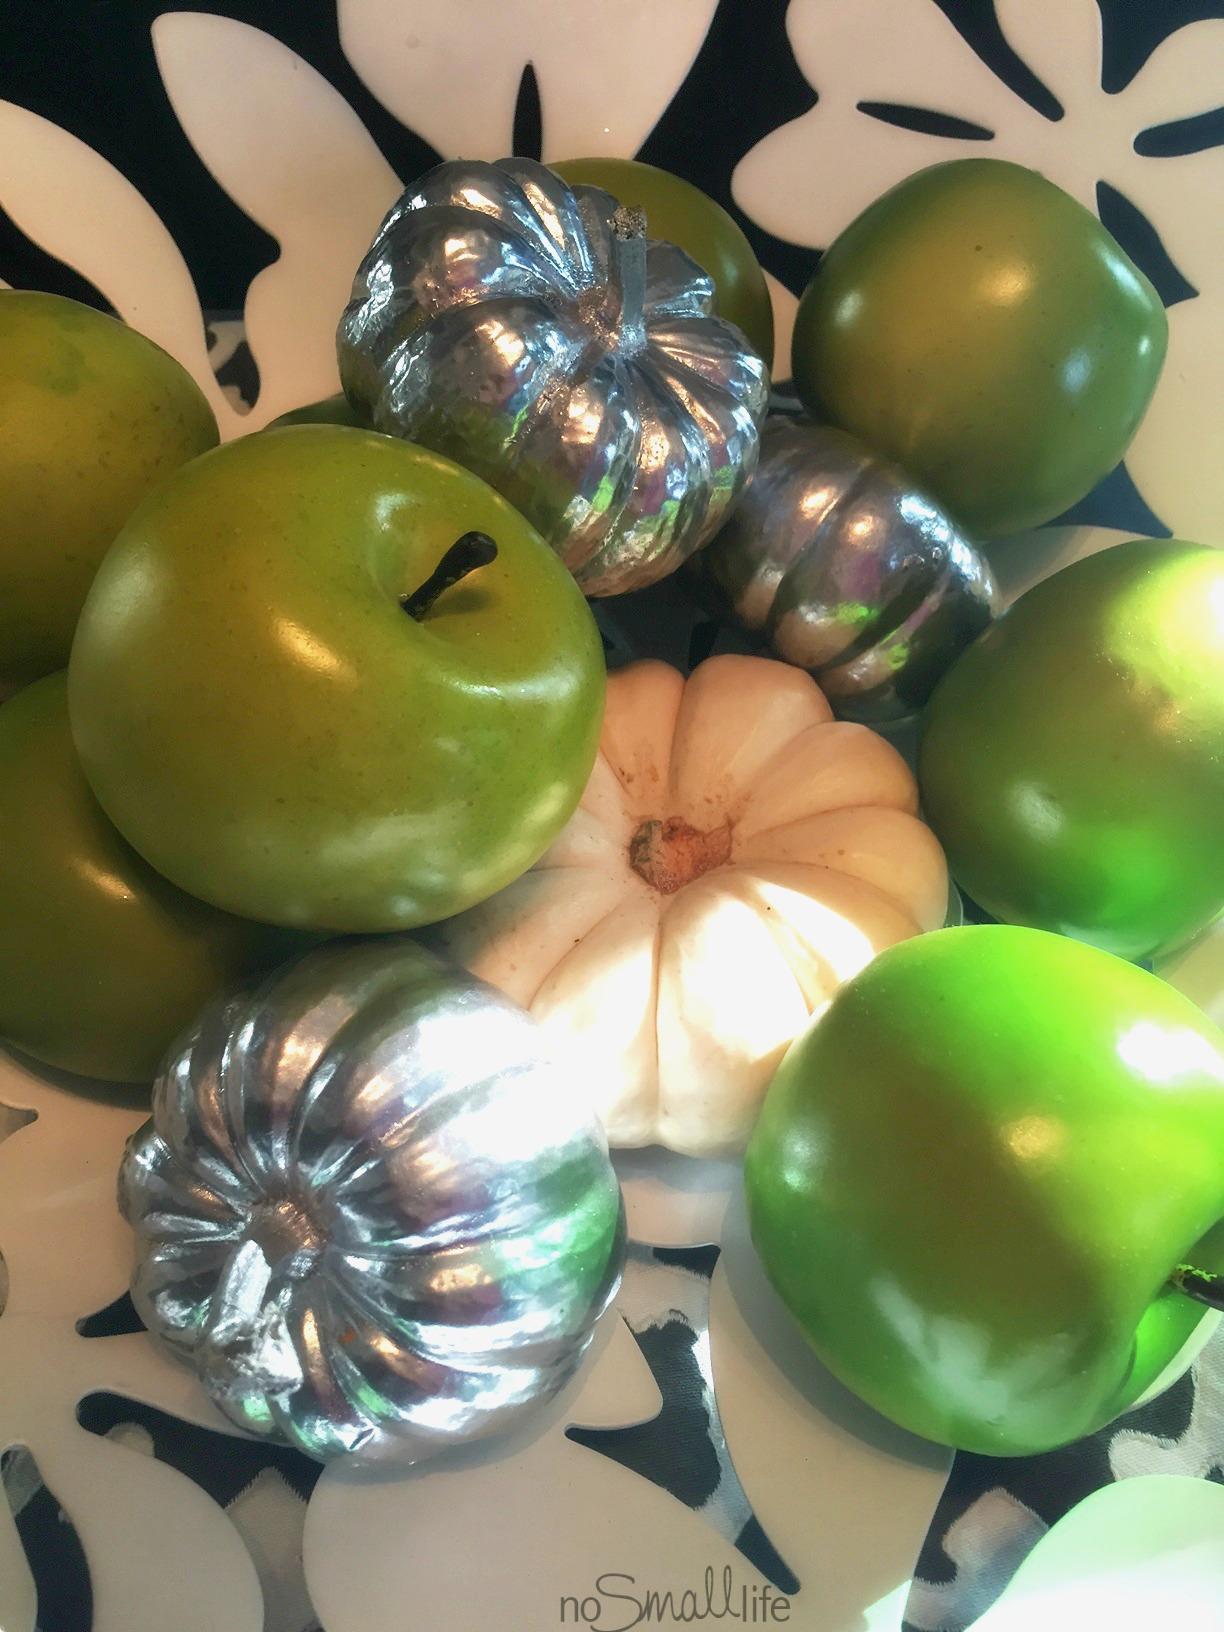 Apples & Spray-Painted Pumpkins